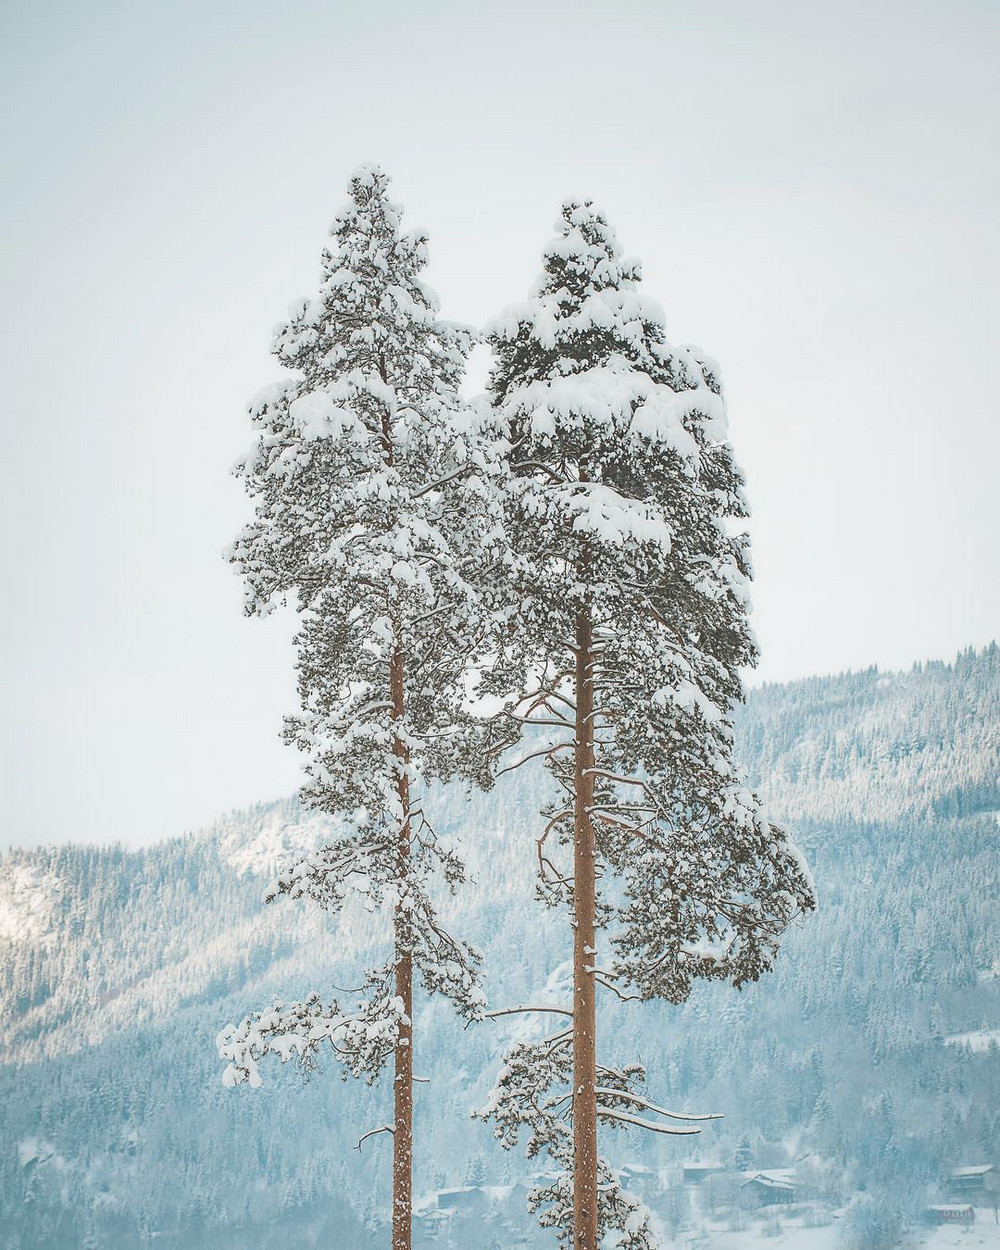 fotografii_norvegiji-21